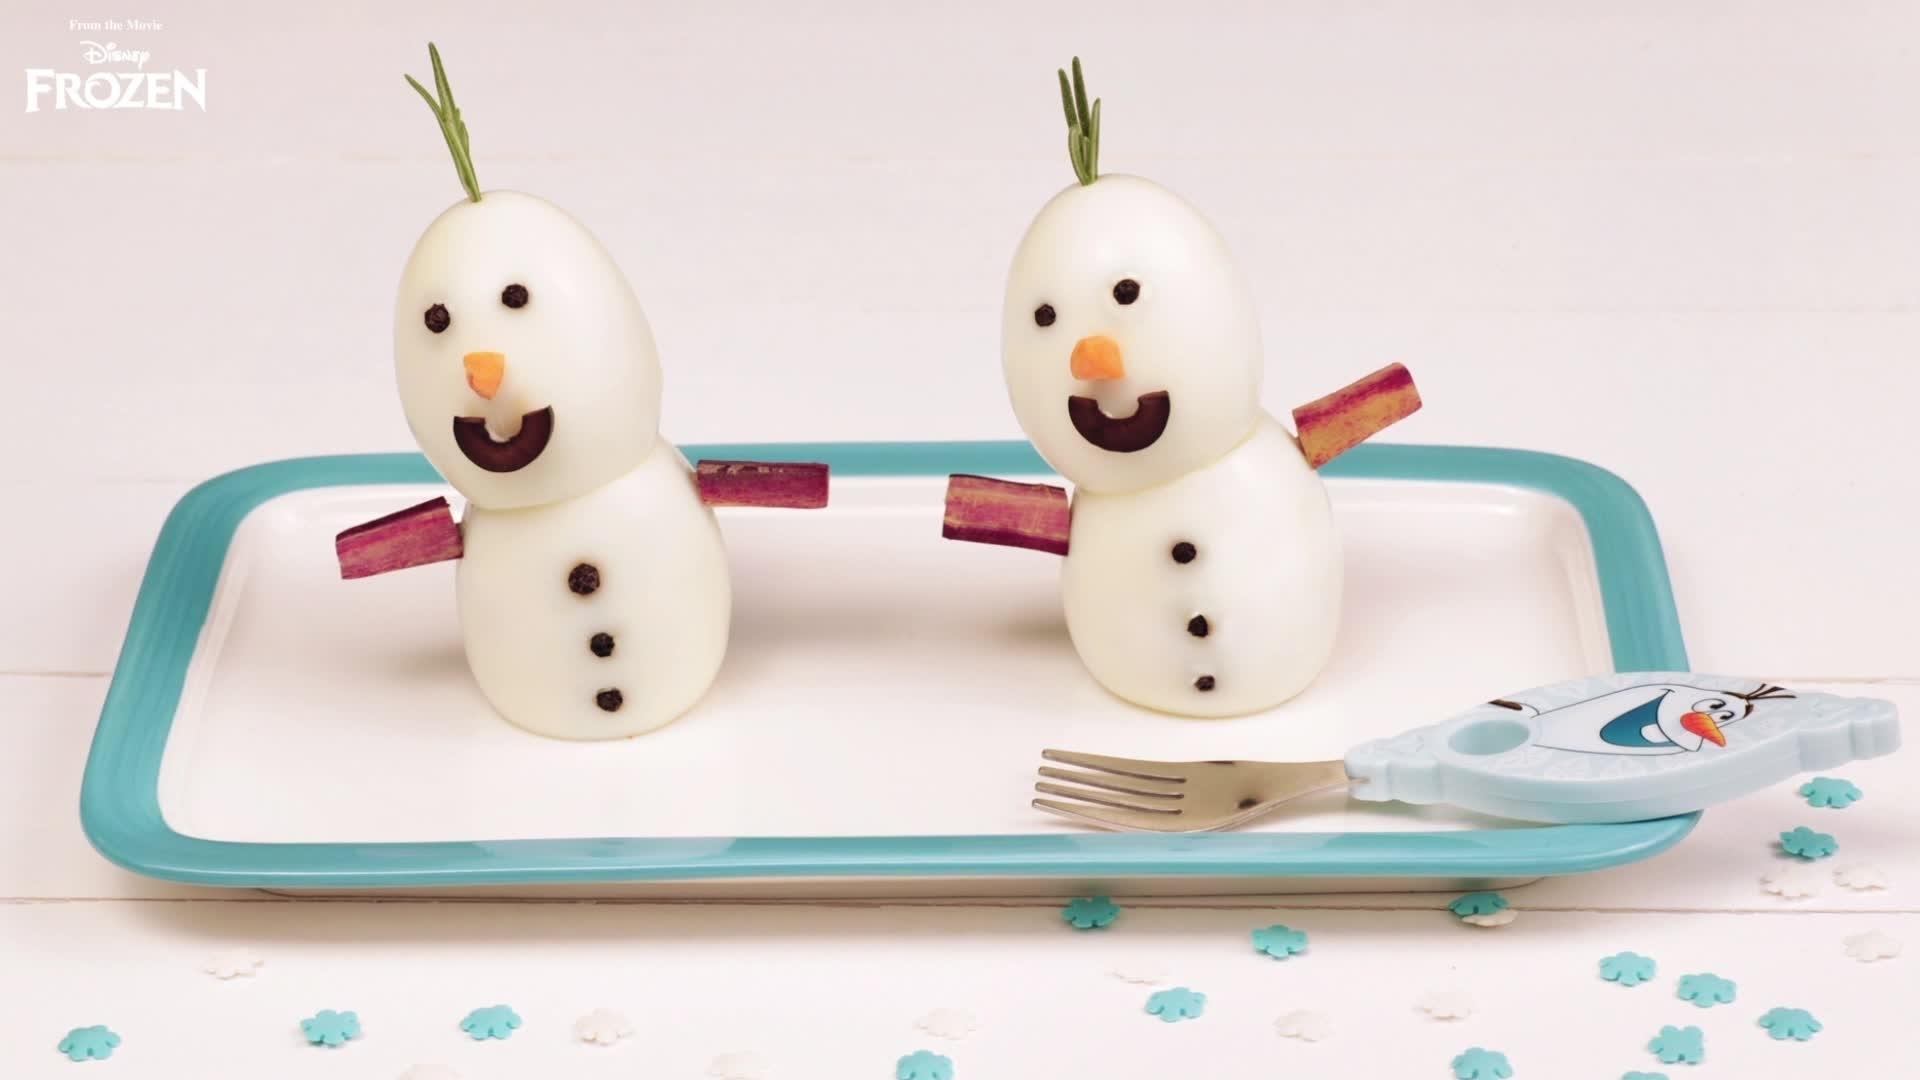 Pupazzi di neve alla Disney Frozen